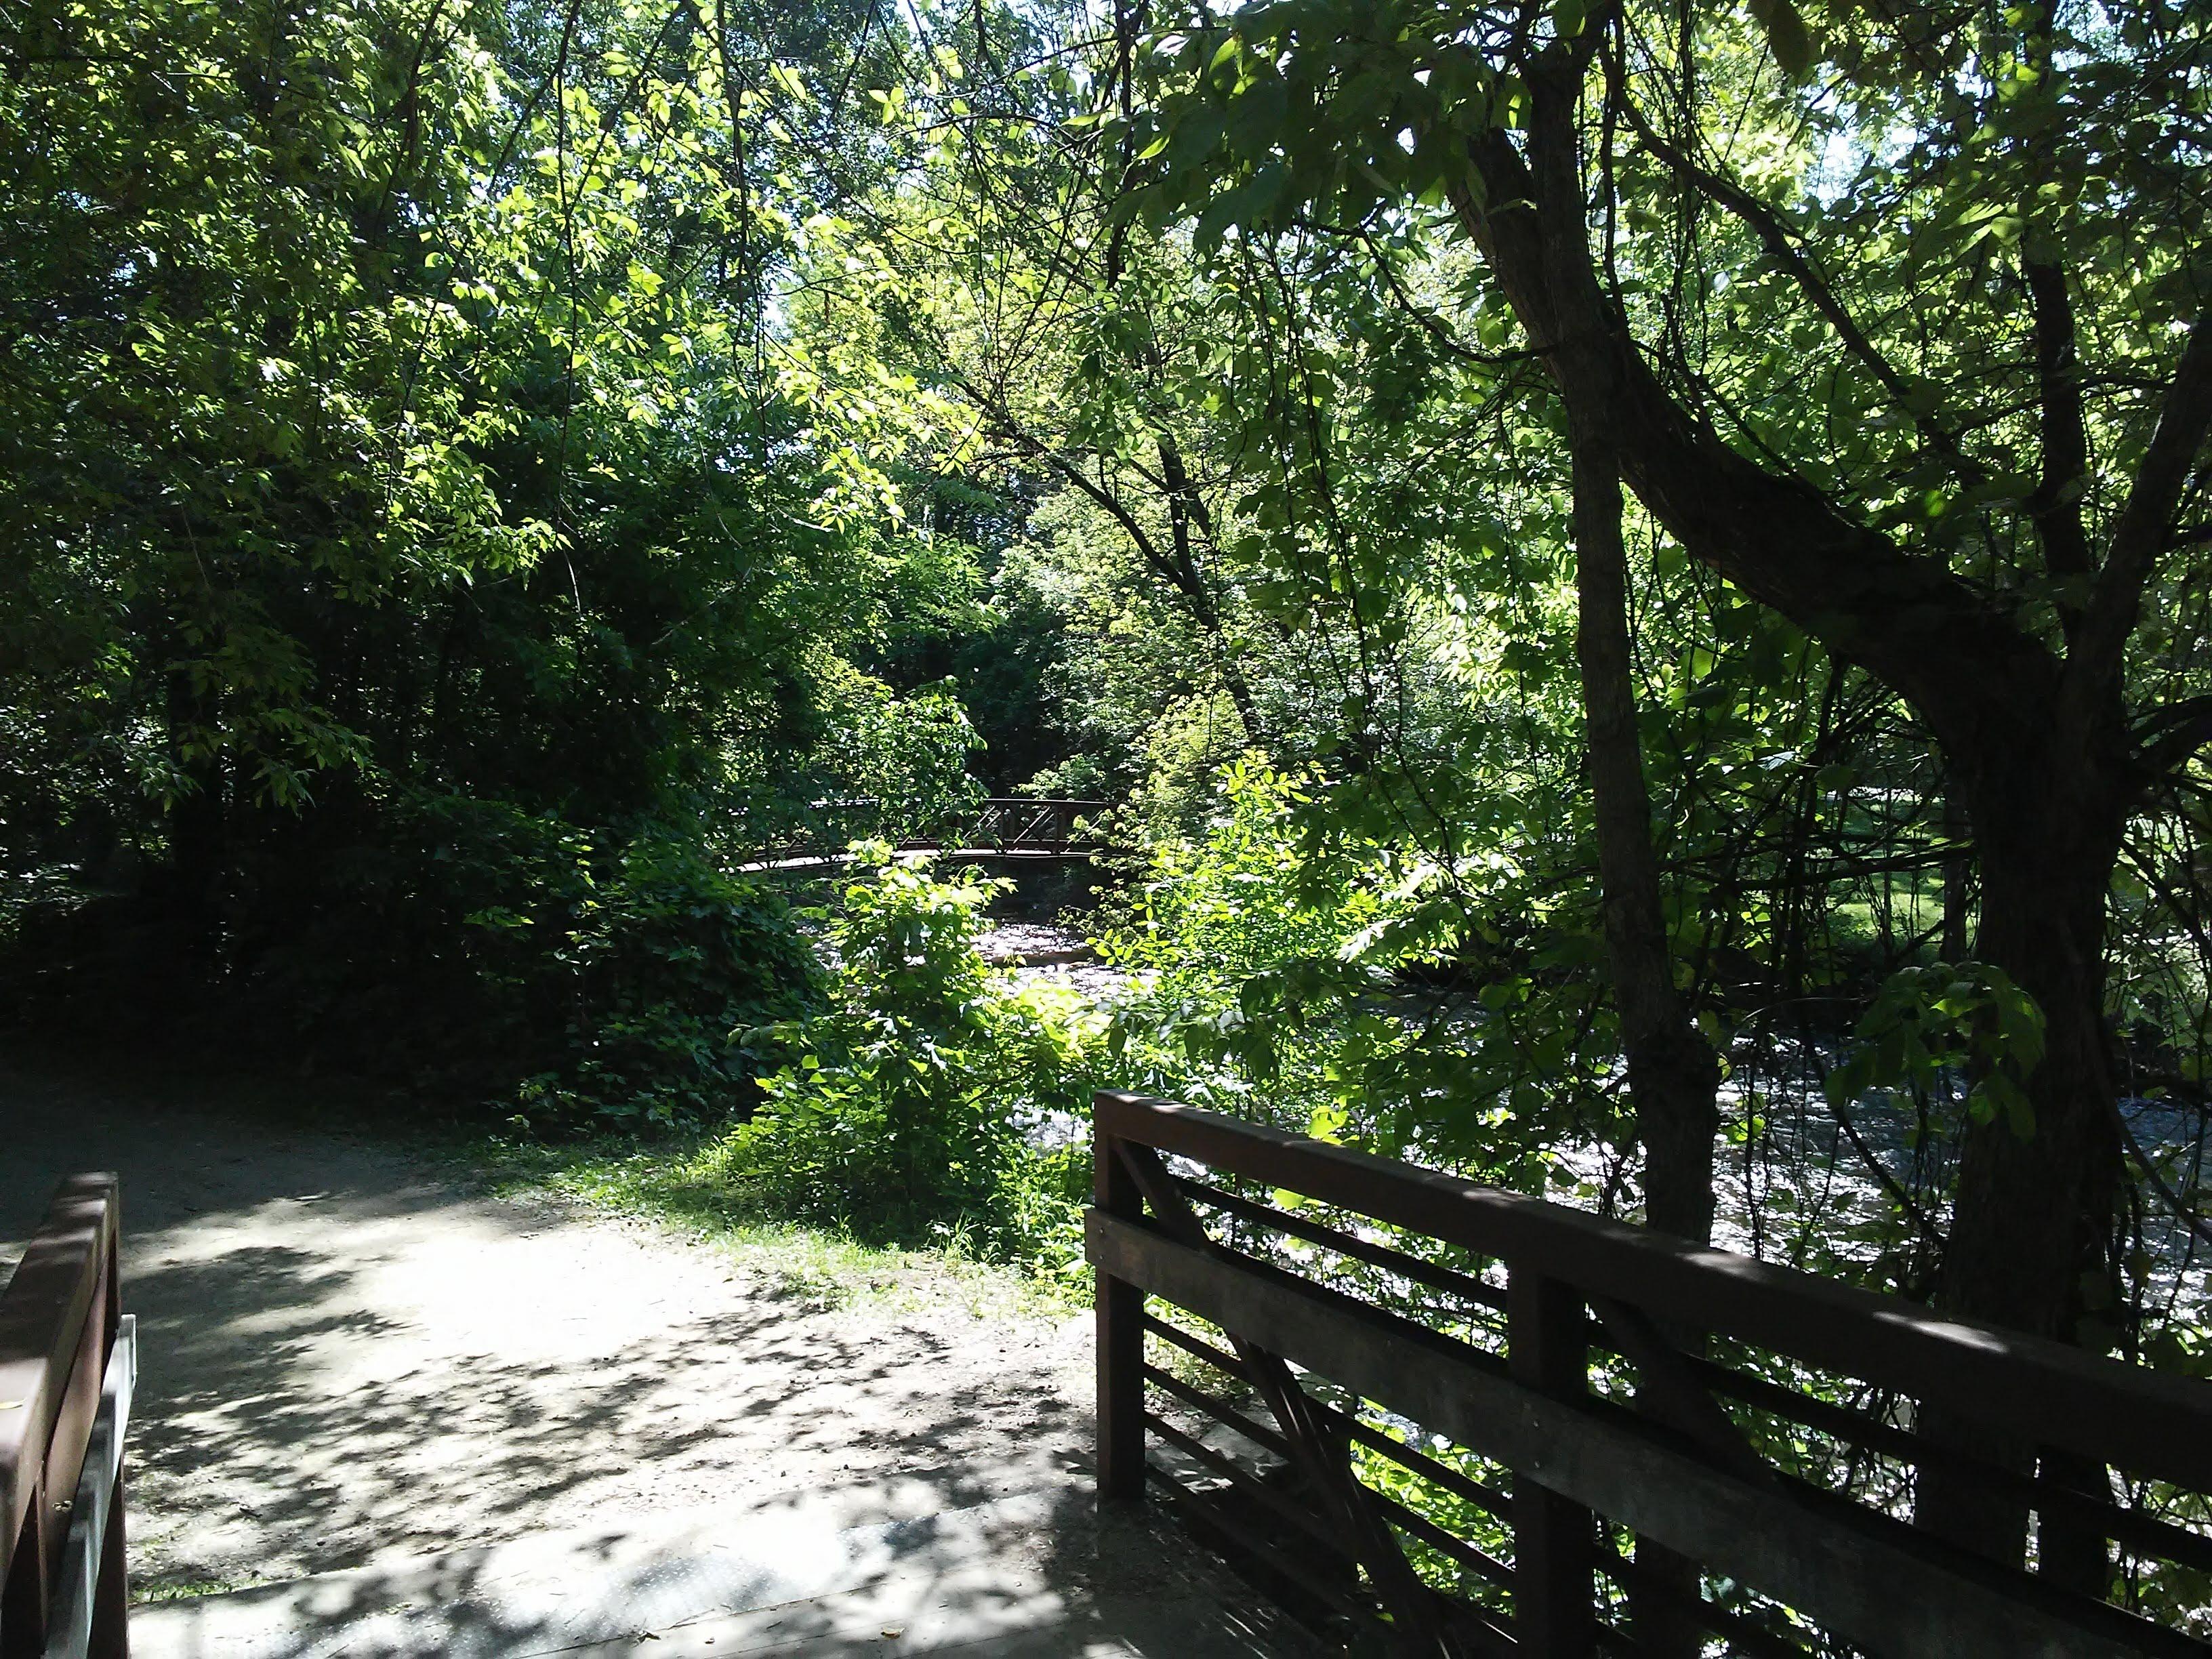 trees, stream, and bridges